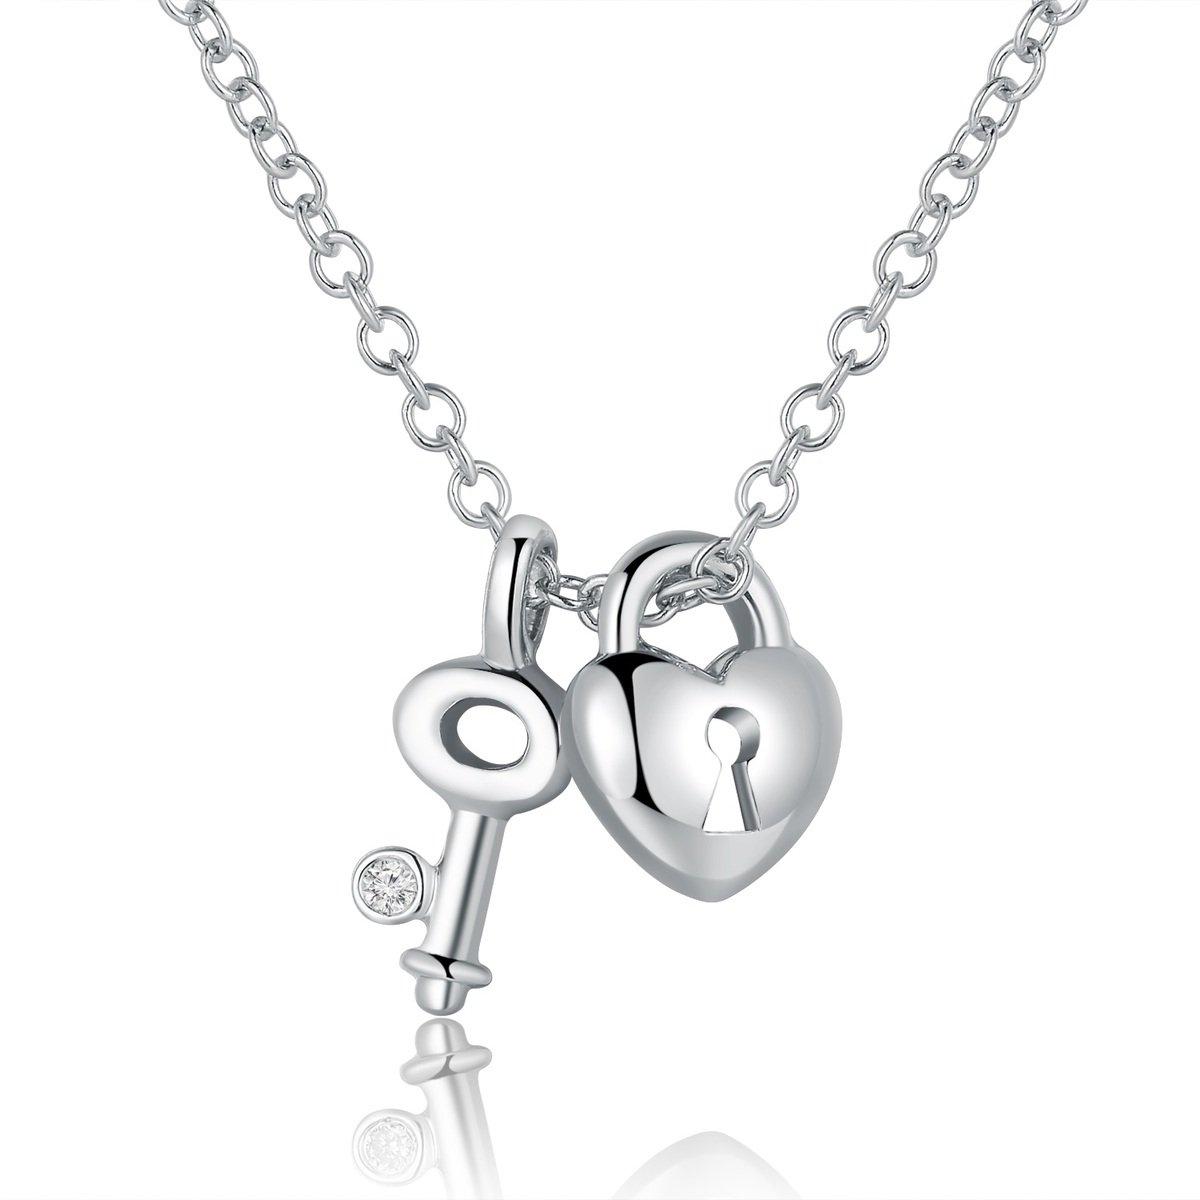 18K/750 白色黃金鑽石鑰匙心鎖項鍊 (16吋)